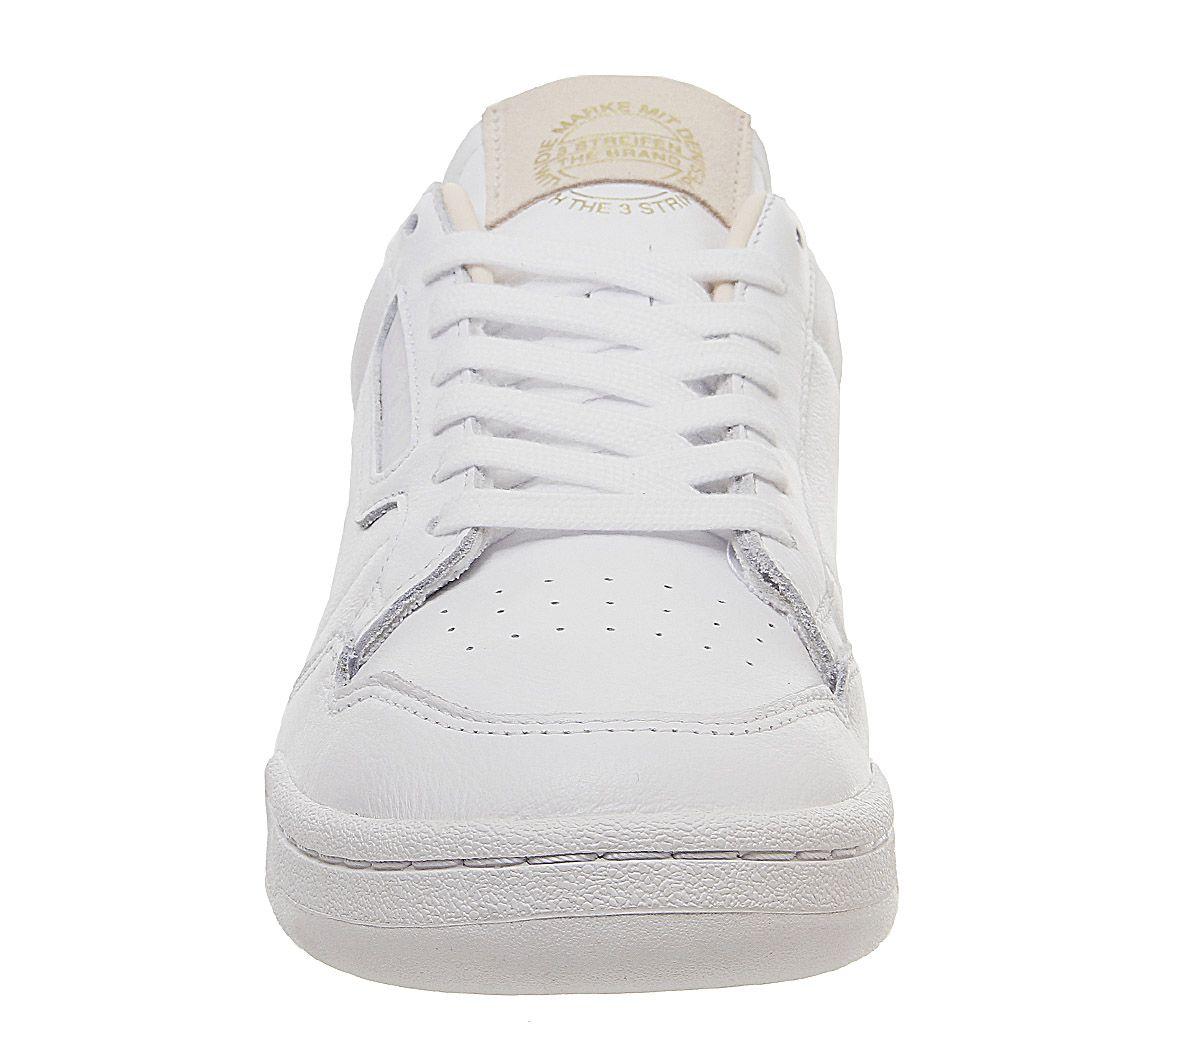 Adidas-Continental-80S-Scarpe-da-ginnastica-White-White-Scarpe-da-ginnastica-bianco-cristallo miniatura 3